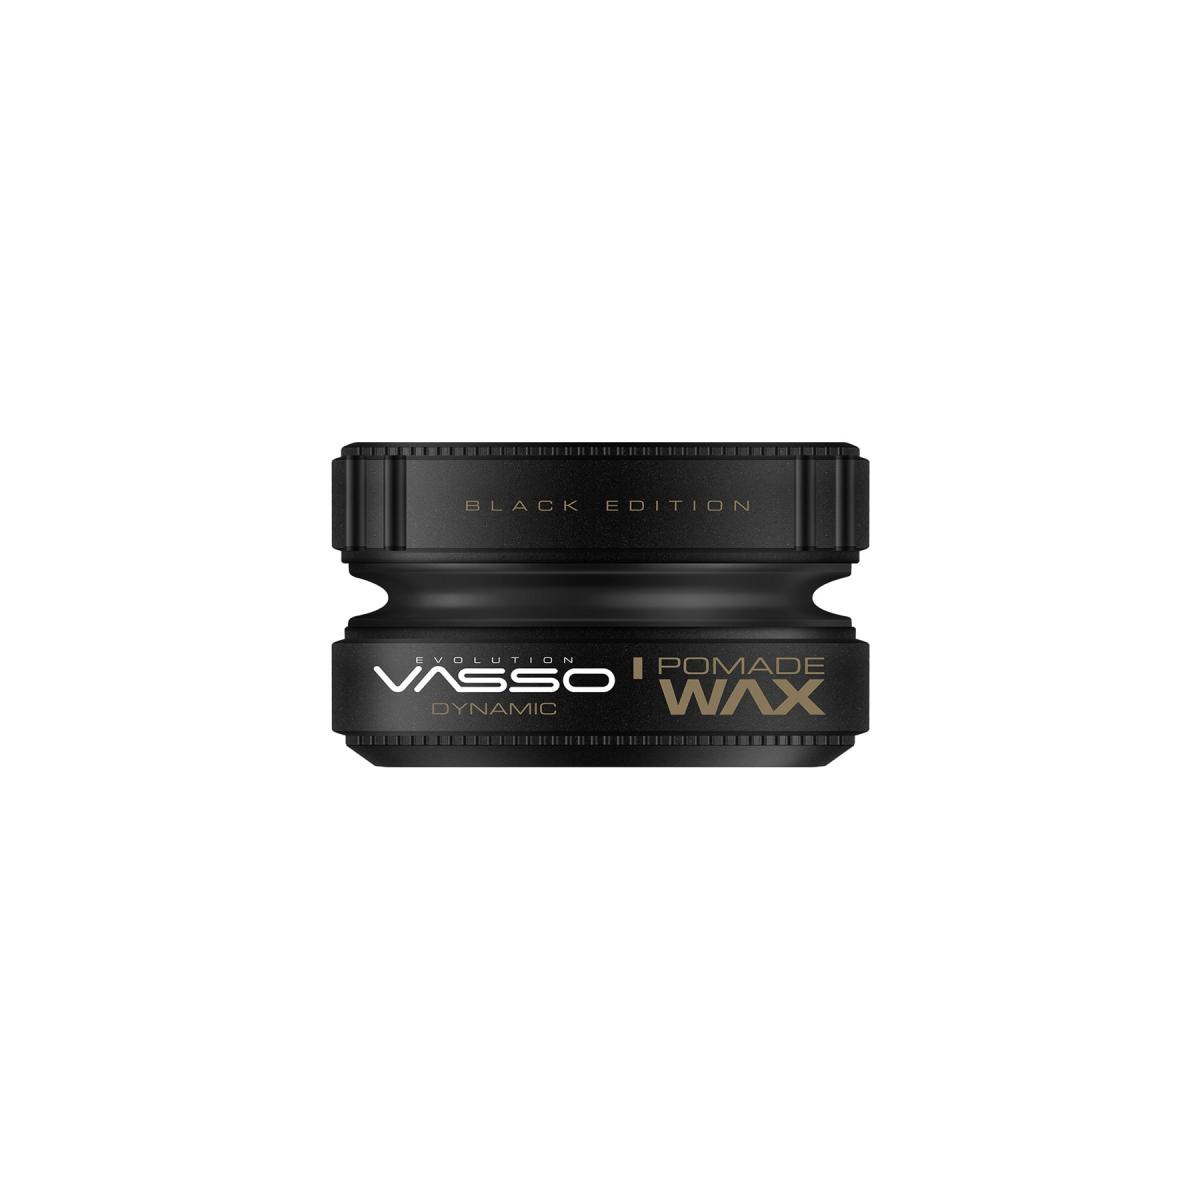 VASSO MAN Süper Tutuş Etkili Islak Görünüm Kazandıran Wax - Vasso Dynamic Pomade Wax 150 Ml